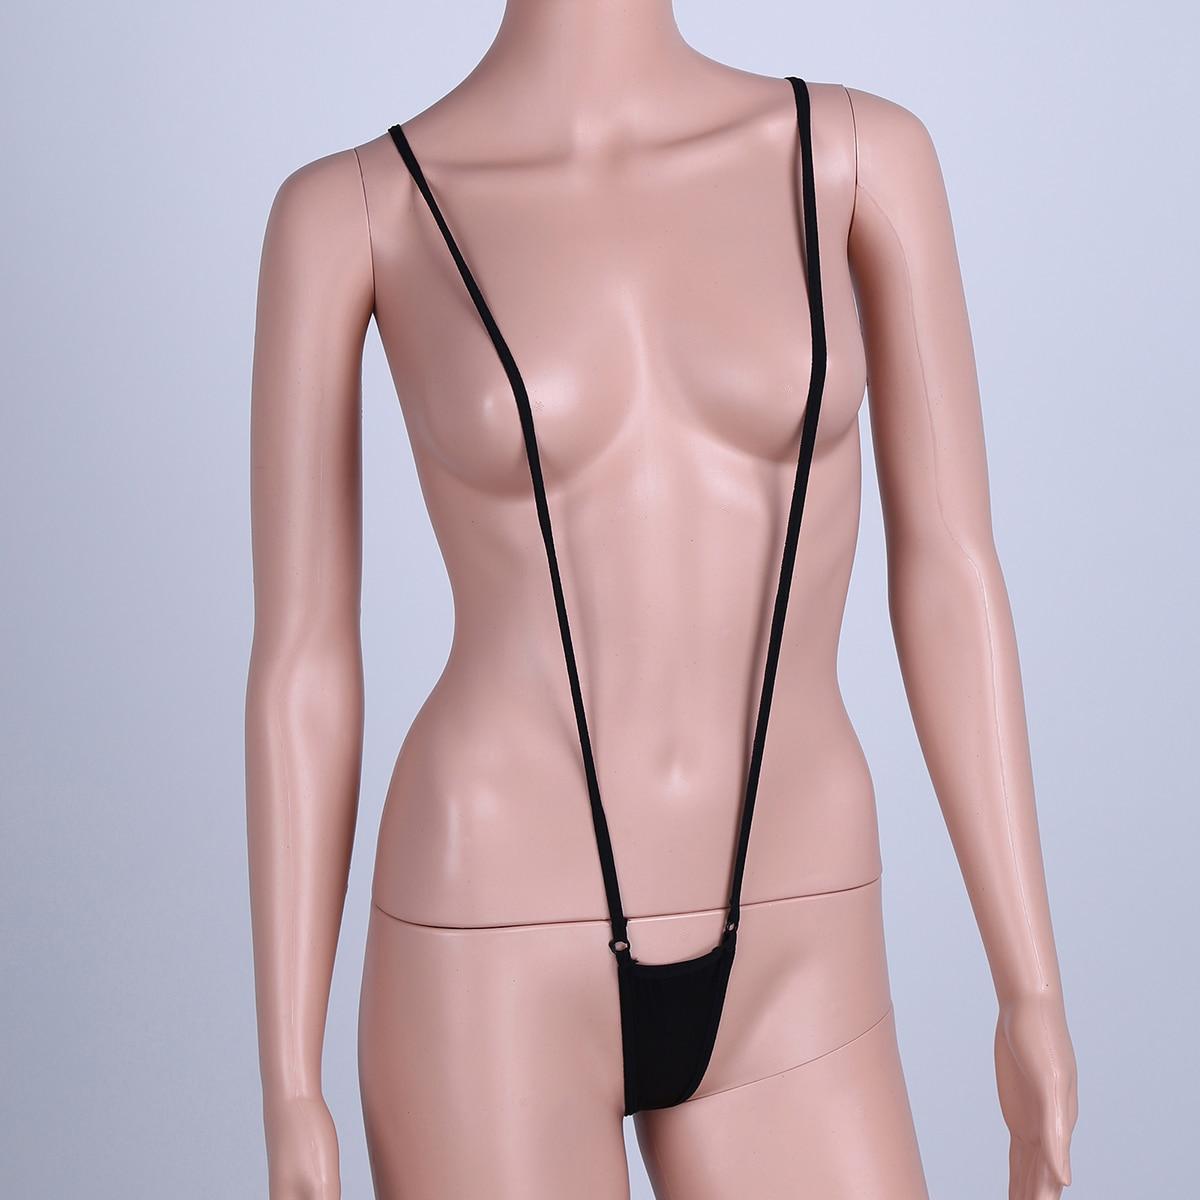 Sexy Swimsuit Monokini With Adjustable Strap One Piece Women Bikini Bottoms Swimwear Bodysuit Cheeky Lingerie Beach V Thong